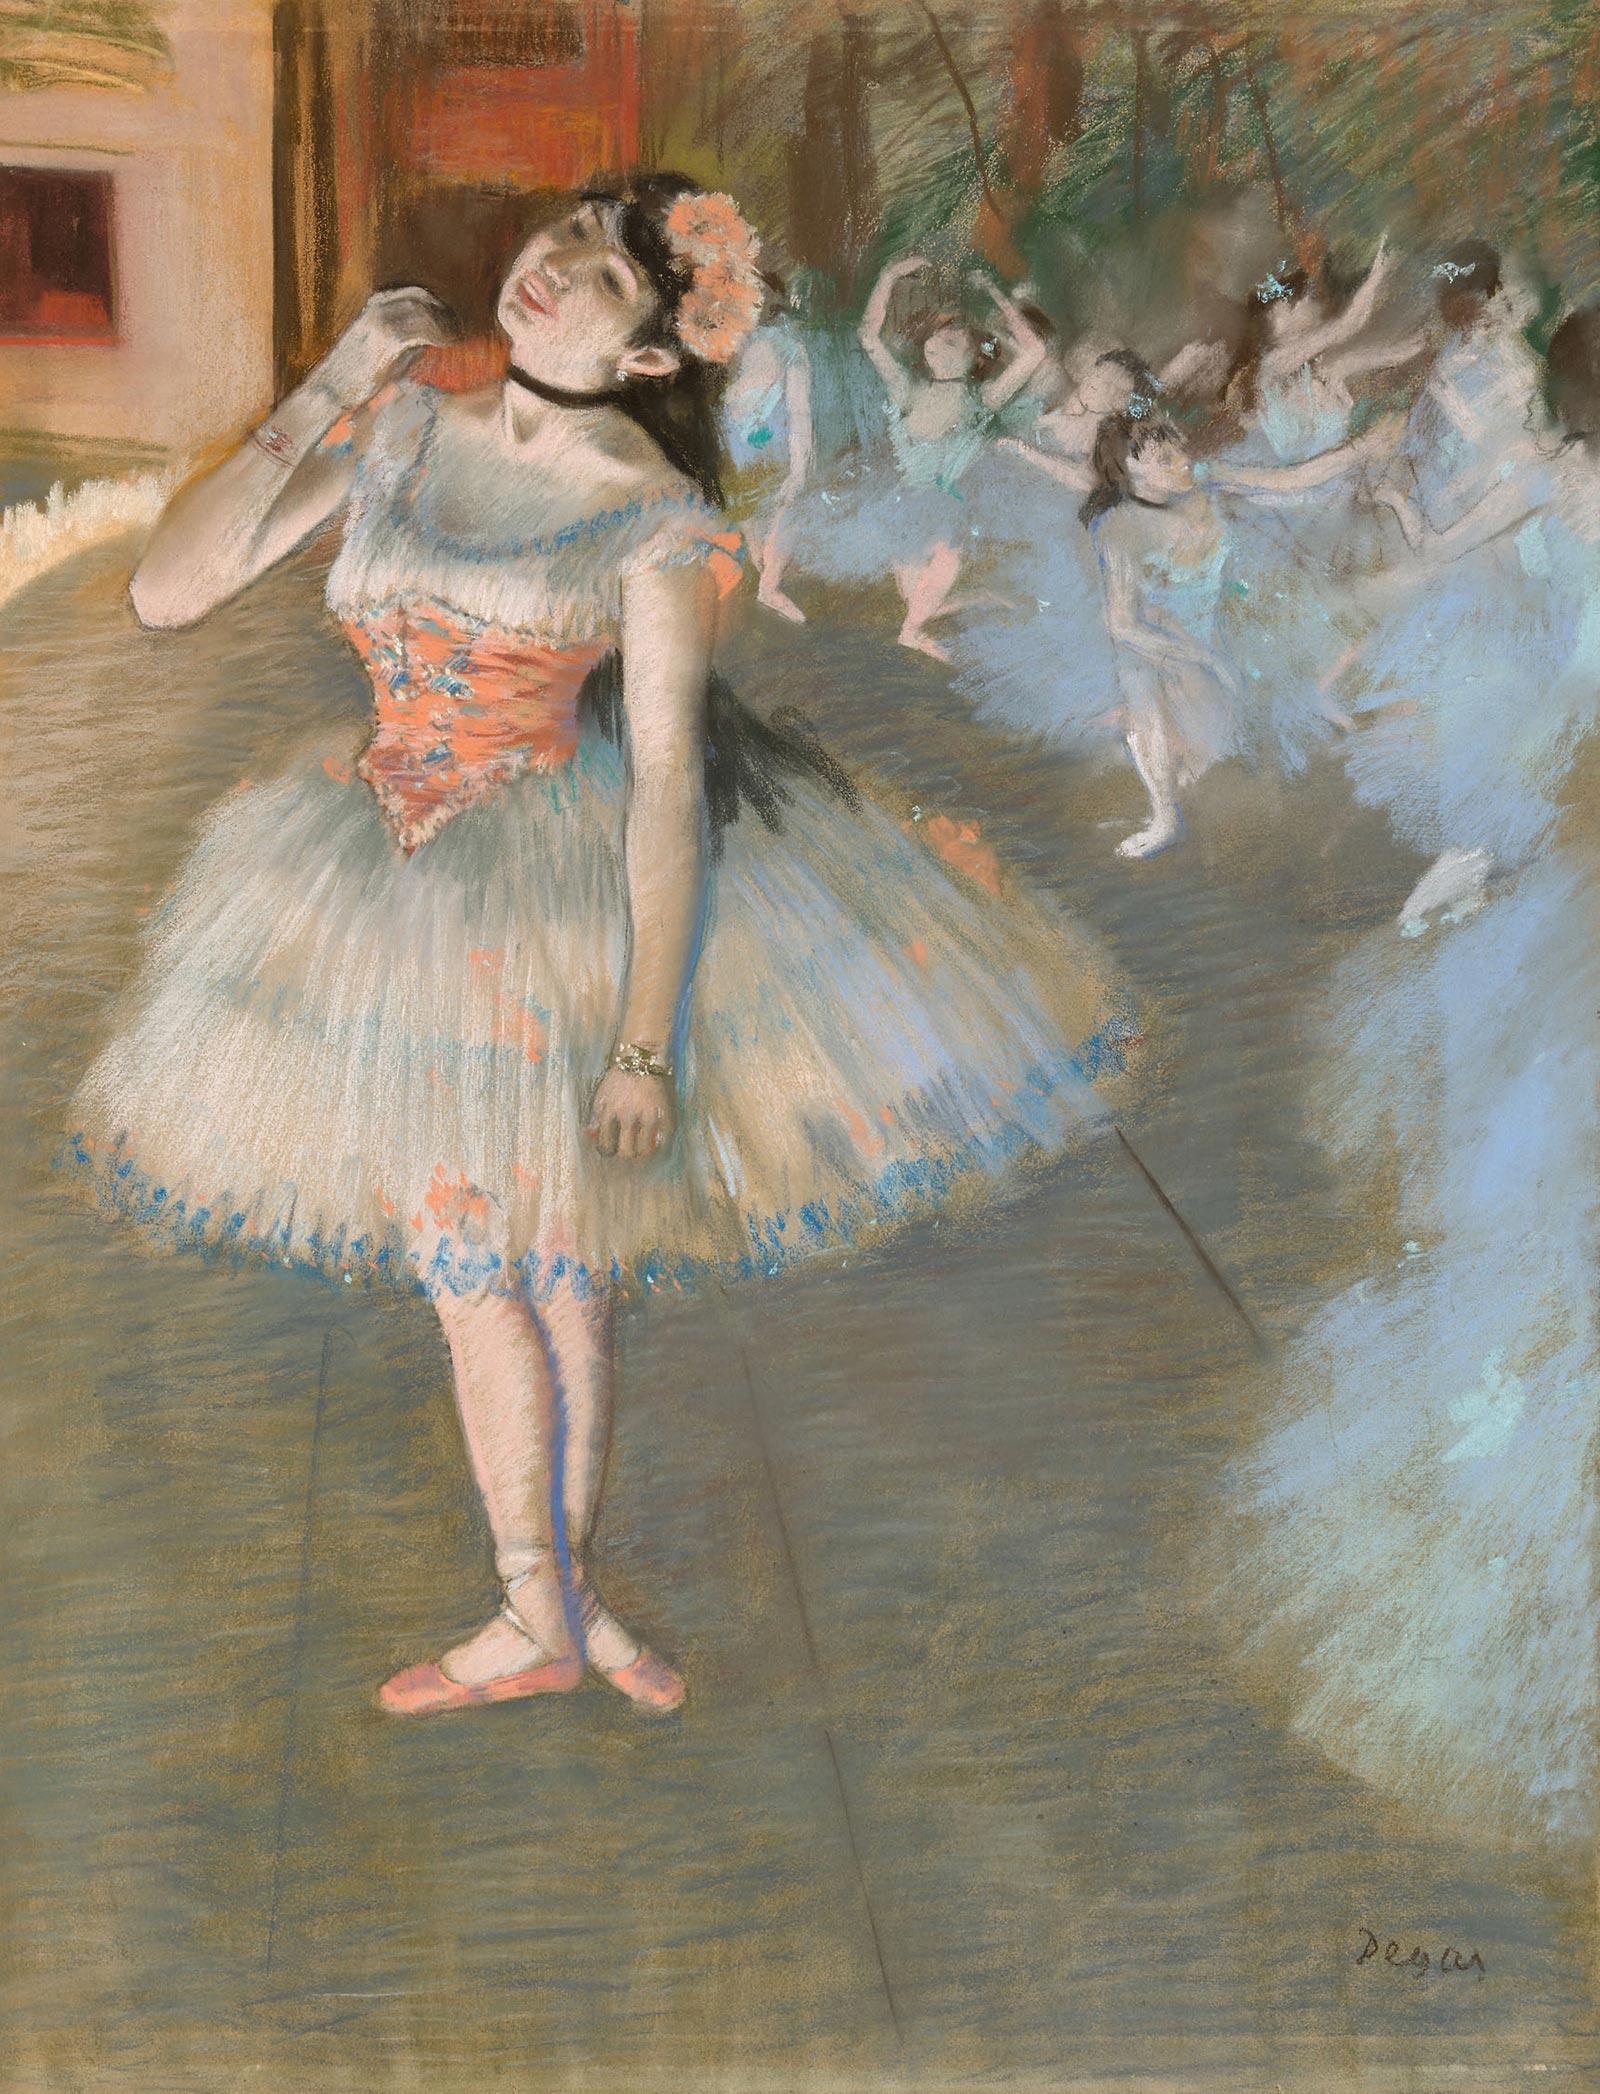 File:Edgar Germain Hilaire Degas 009.jpg - Wikimedia Commons